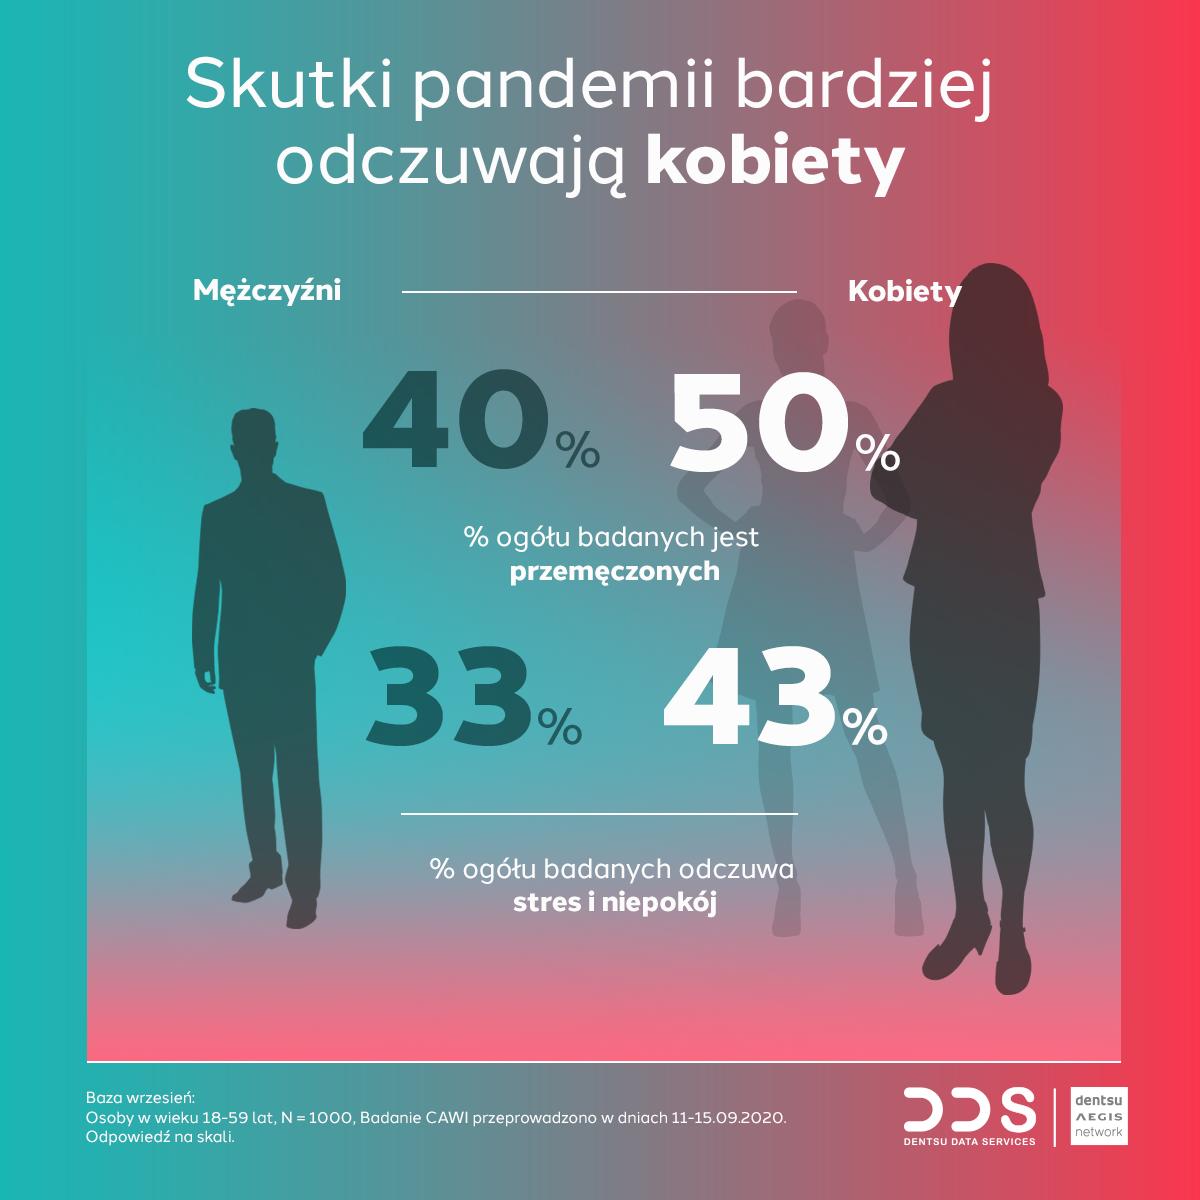 Polacy w pandemii 3